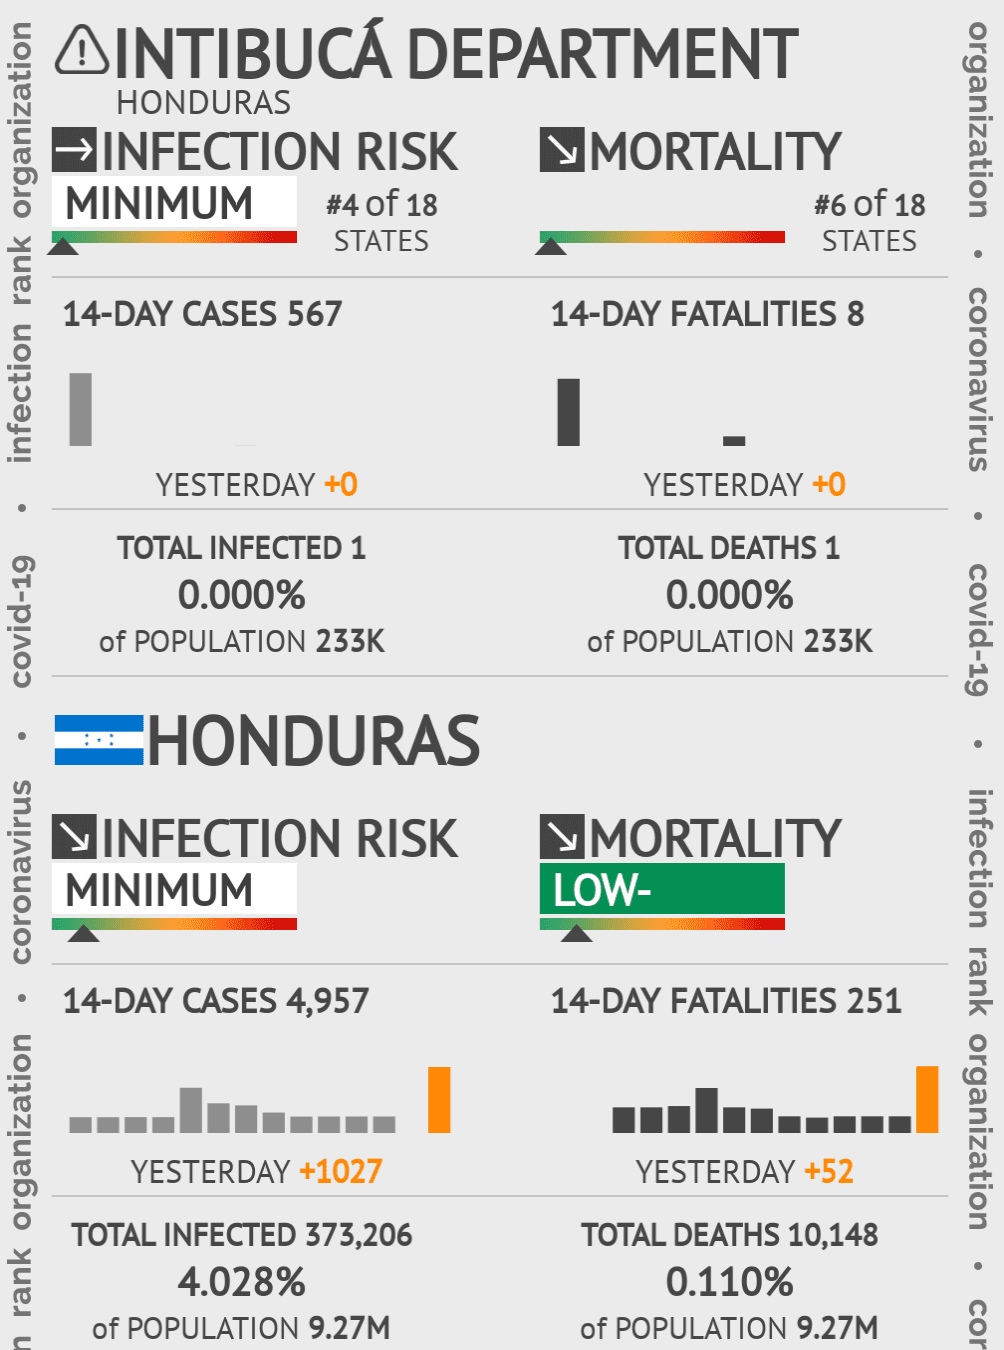 Intibucá Coronavirus Covid-19 Risk of Infection on December 11, 2020